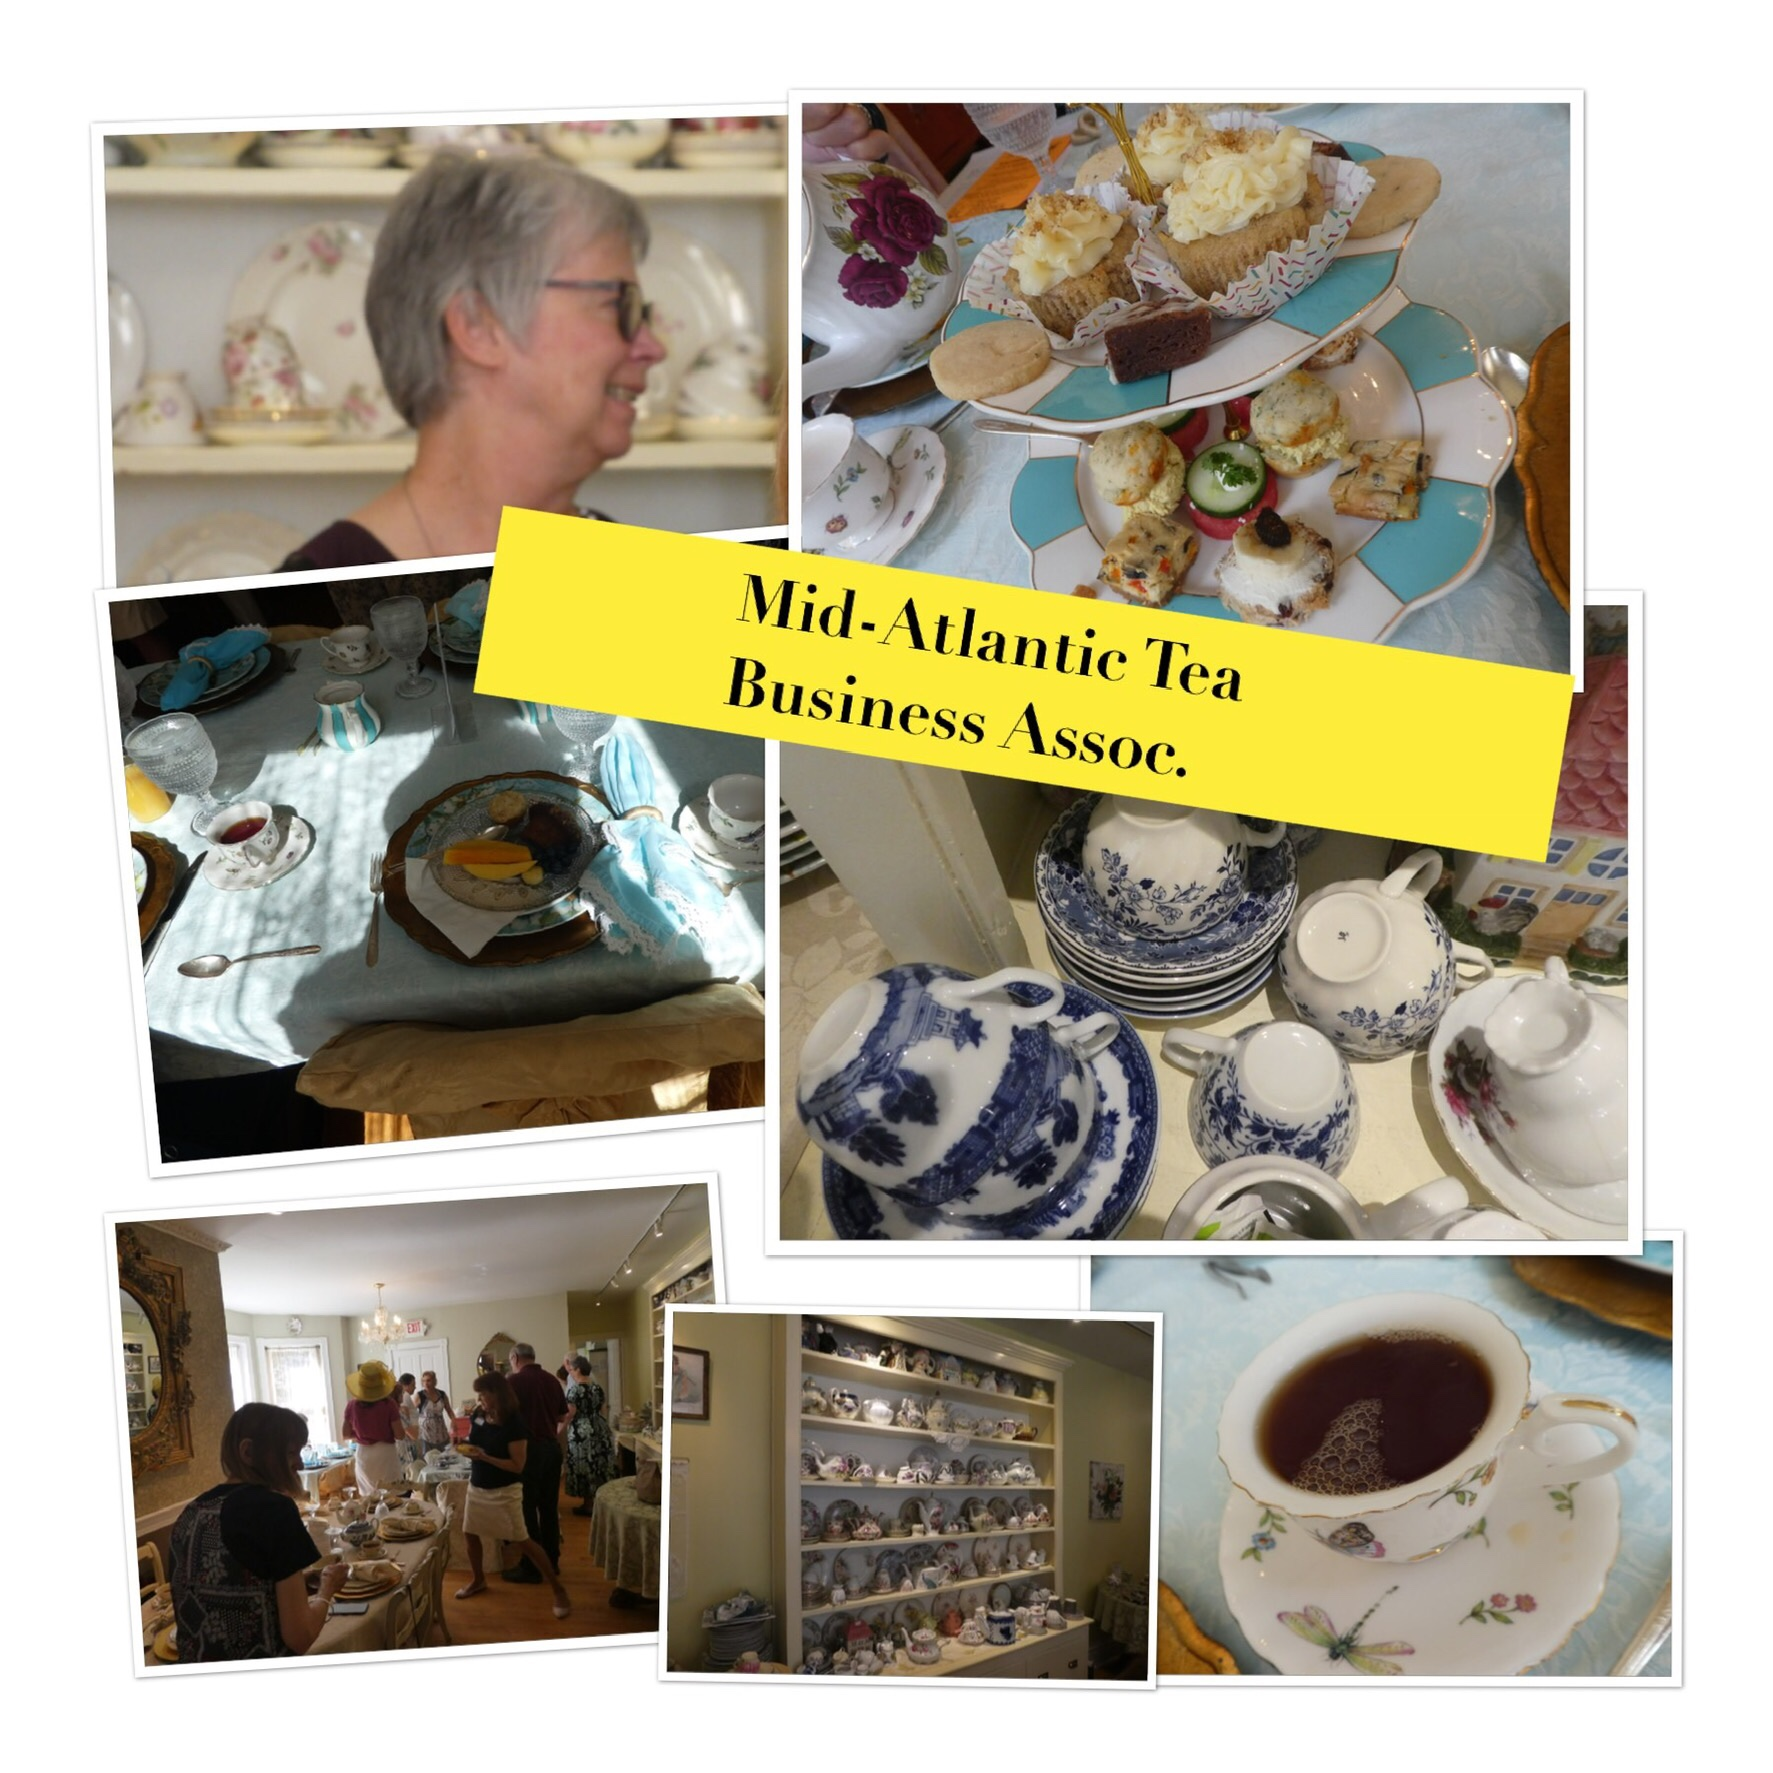 Gathers of the Mid Atlantic Tea Business Association